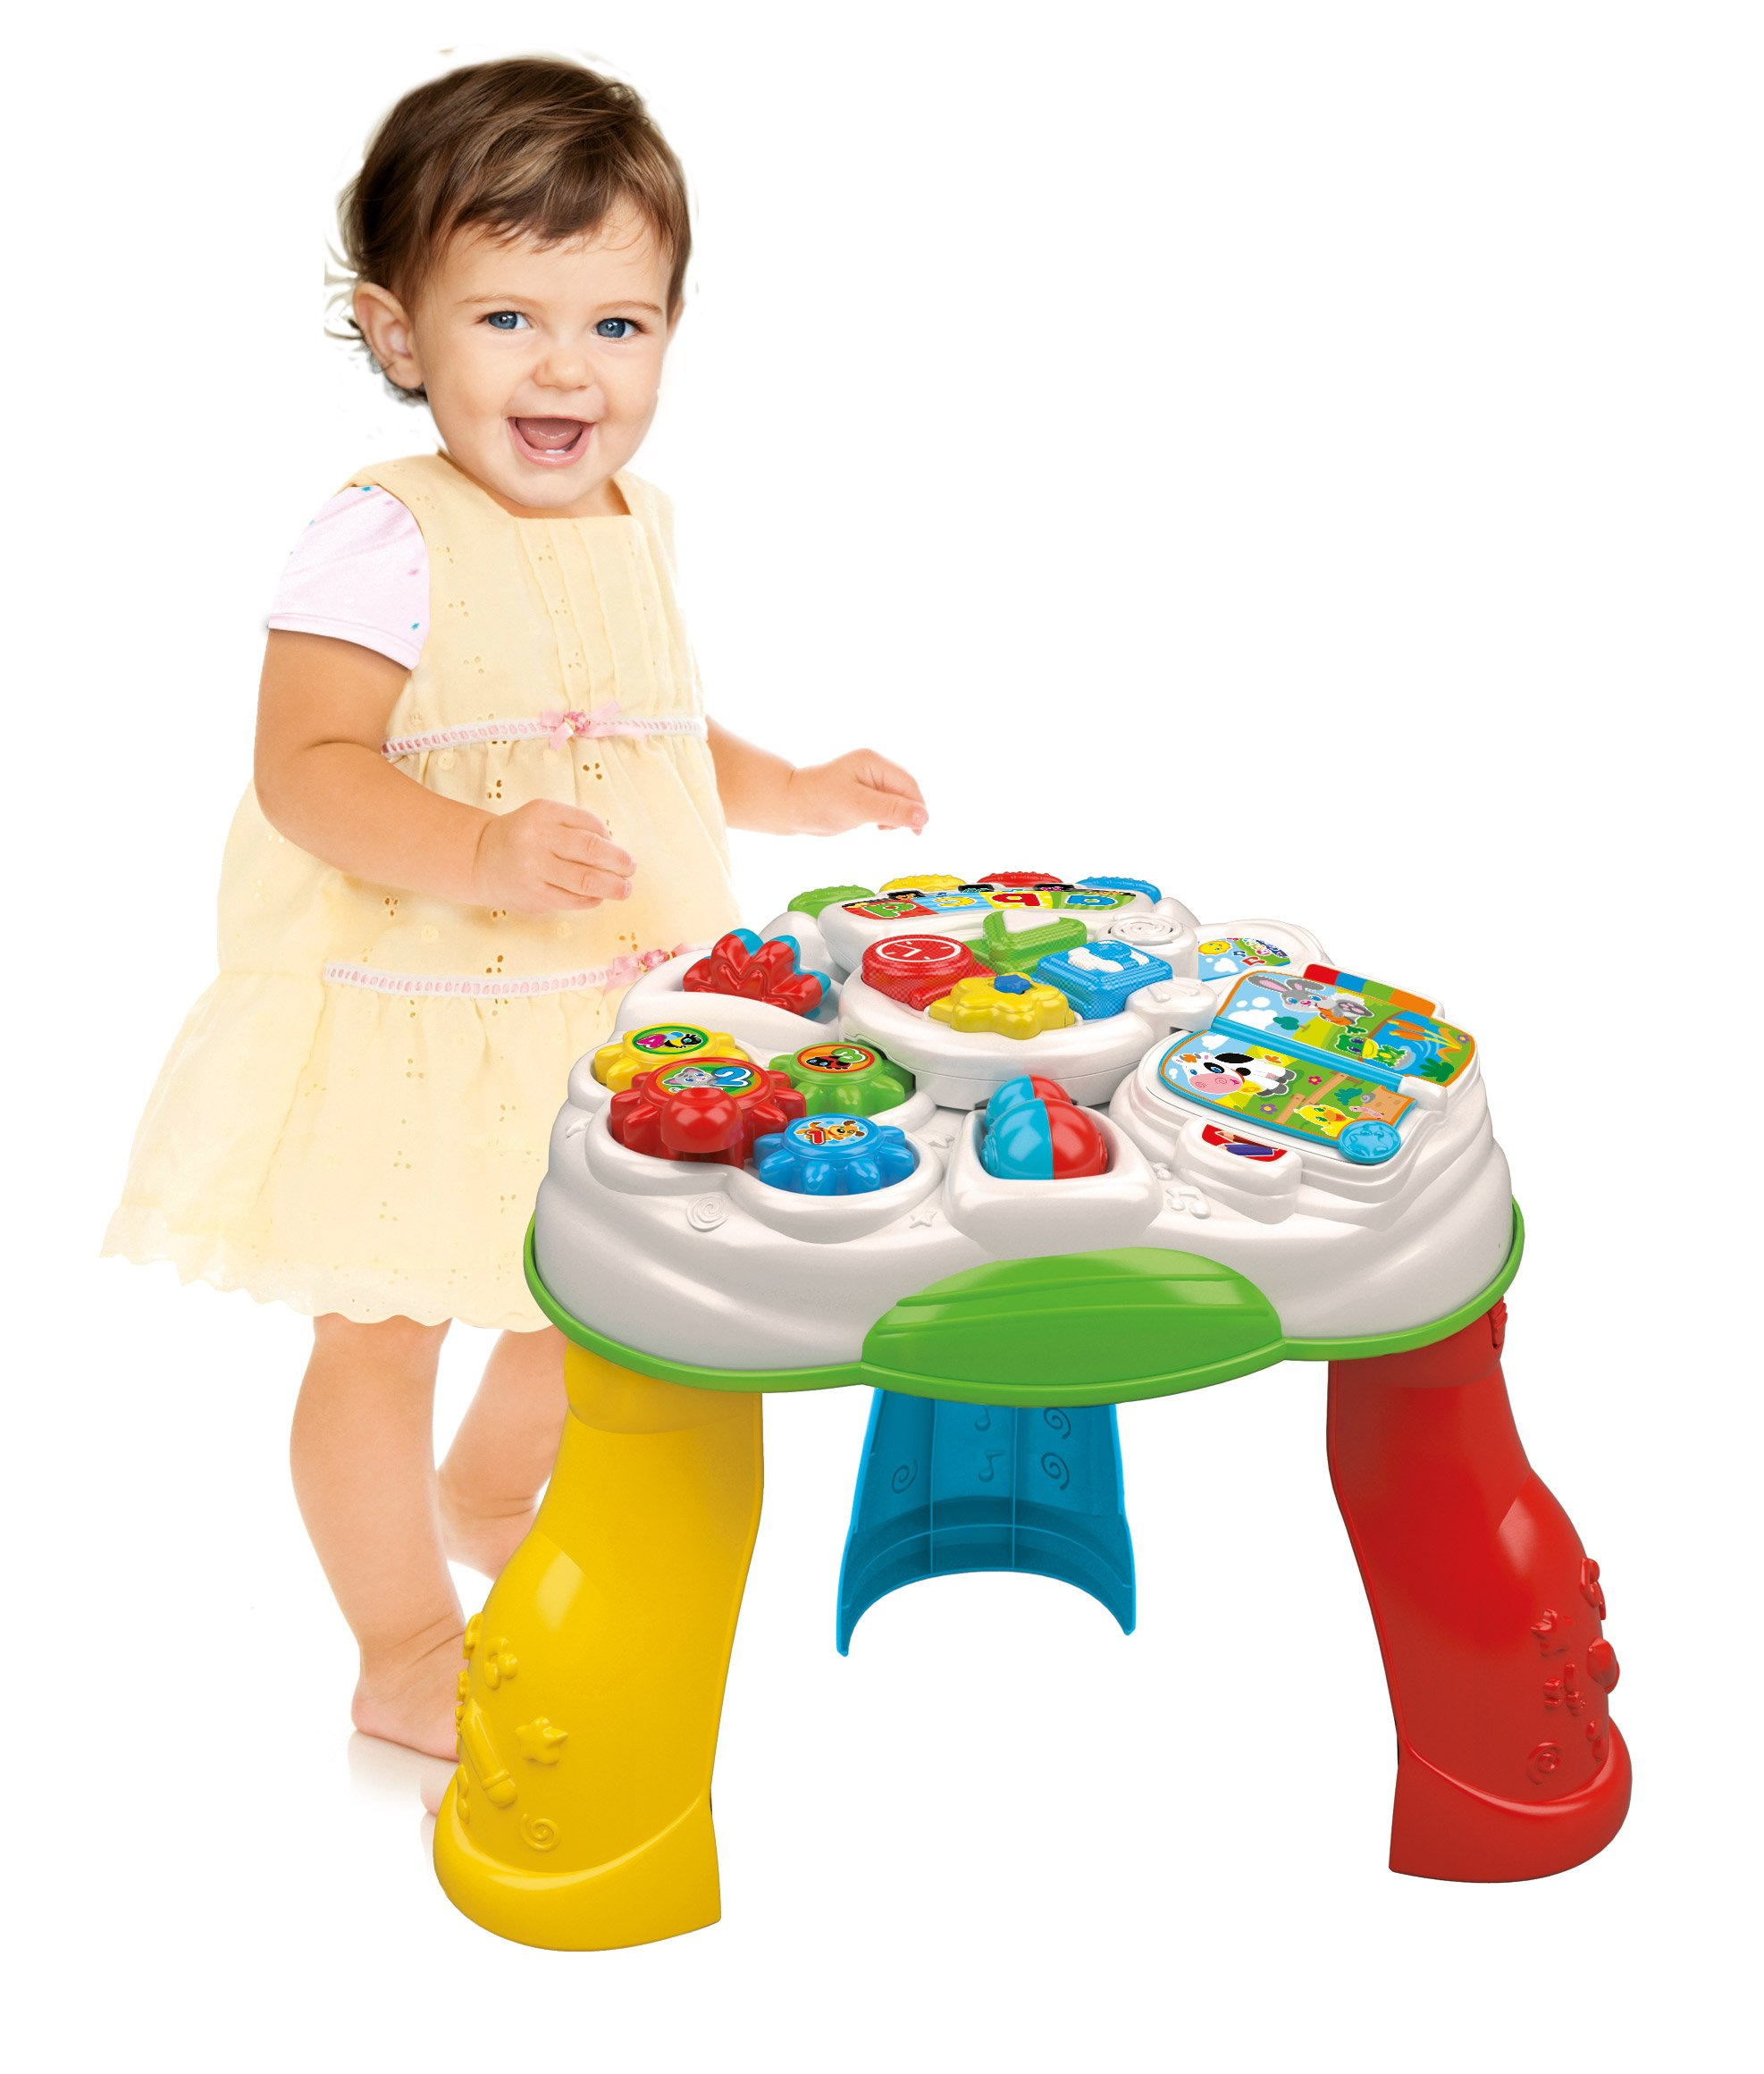 Clementoni-Baby-Tisch-EDUCATIVA-Multi-Spiele-551996